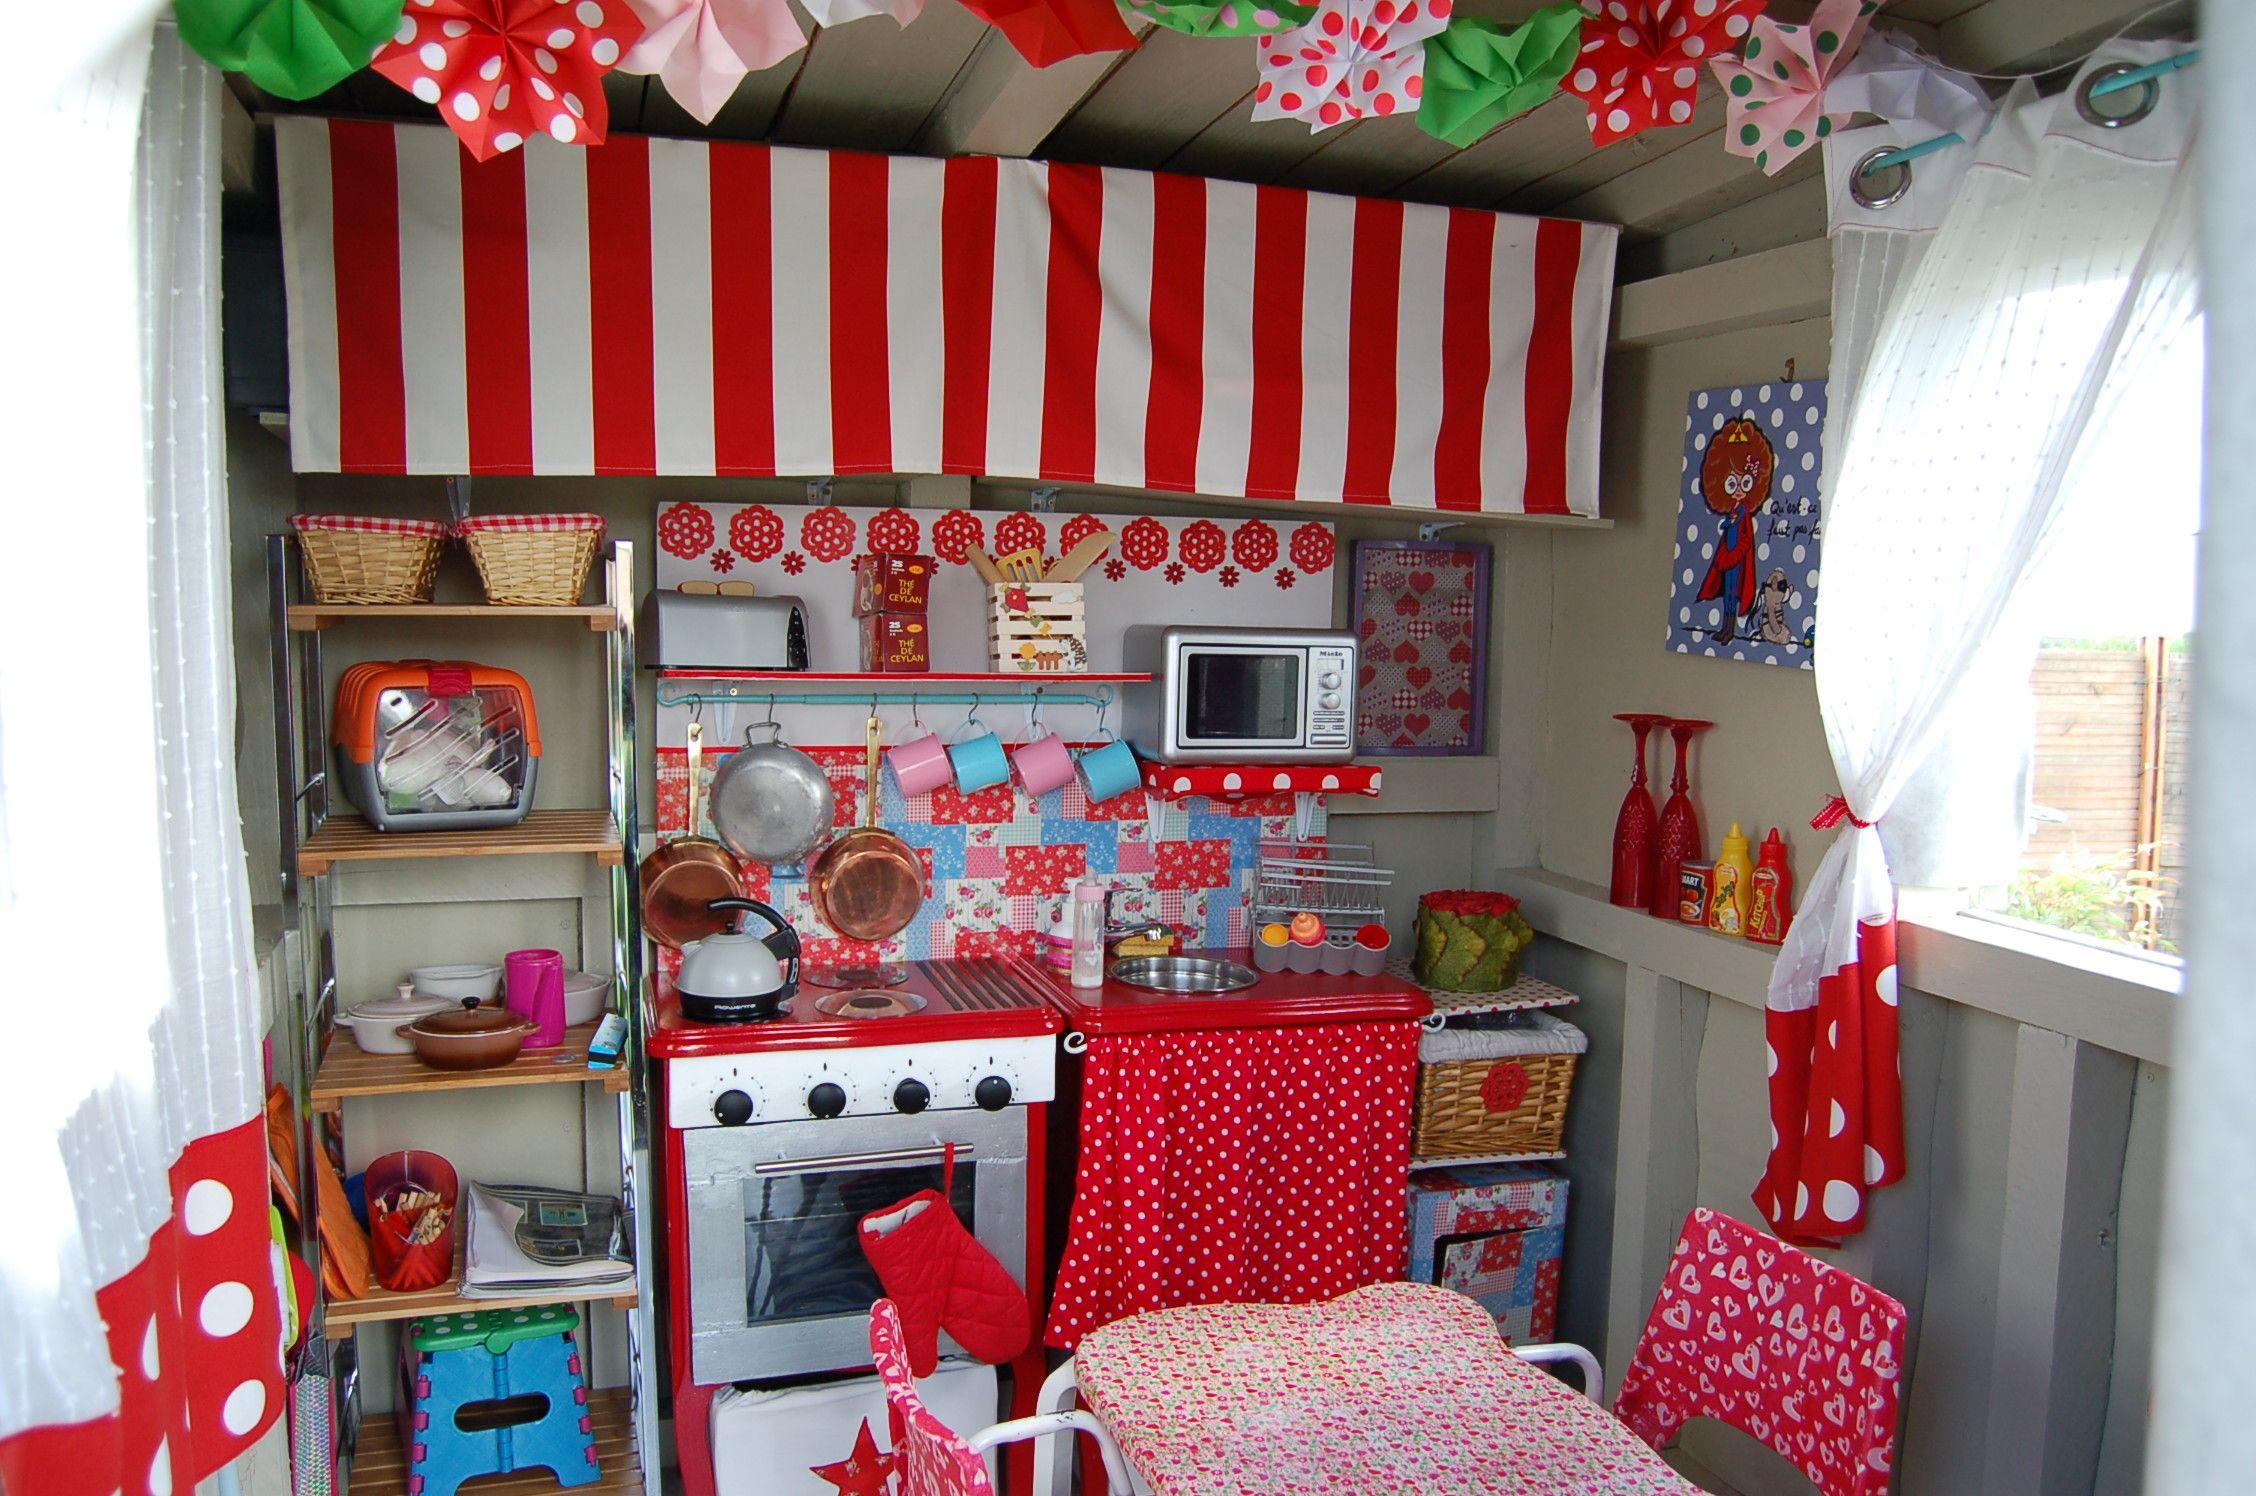 cabane int rieur enfants pinterest cabanes cabane en palette et int rieur. Black Bedroom Furniture Sets. Home Design Ideas